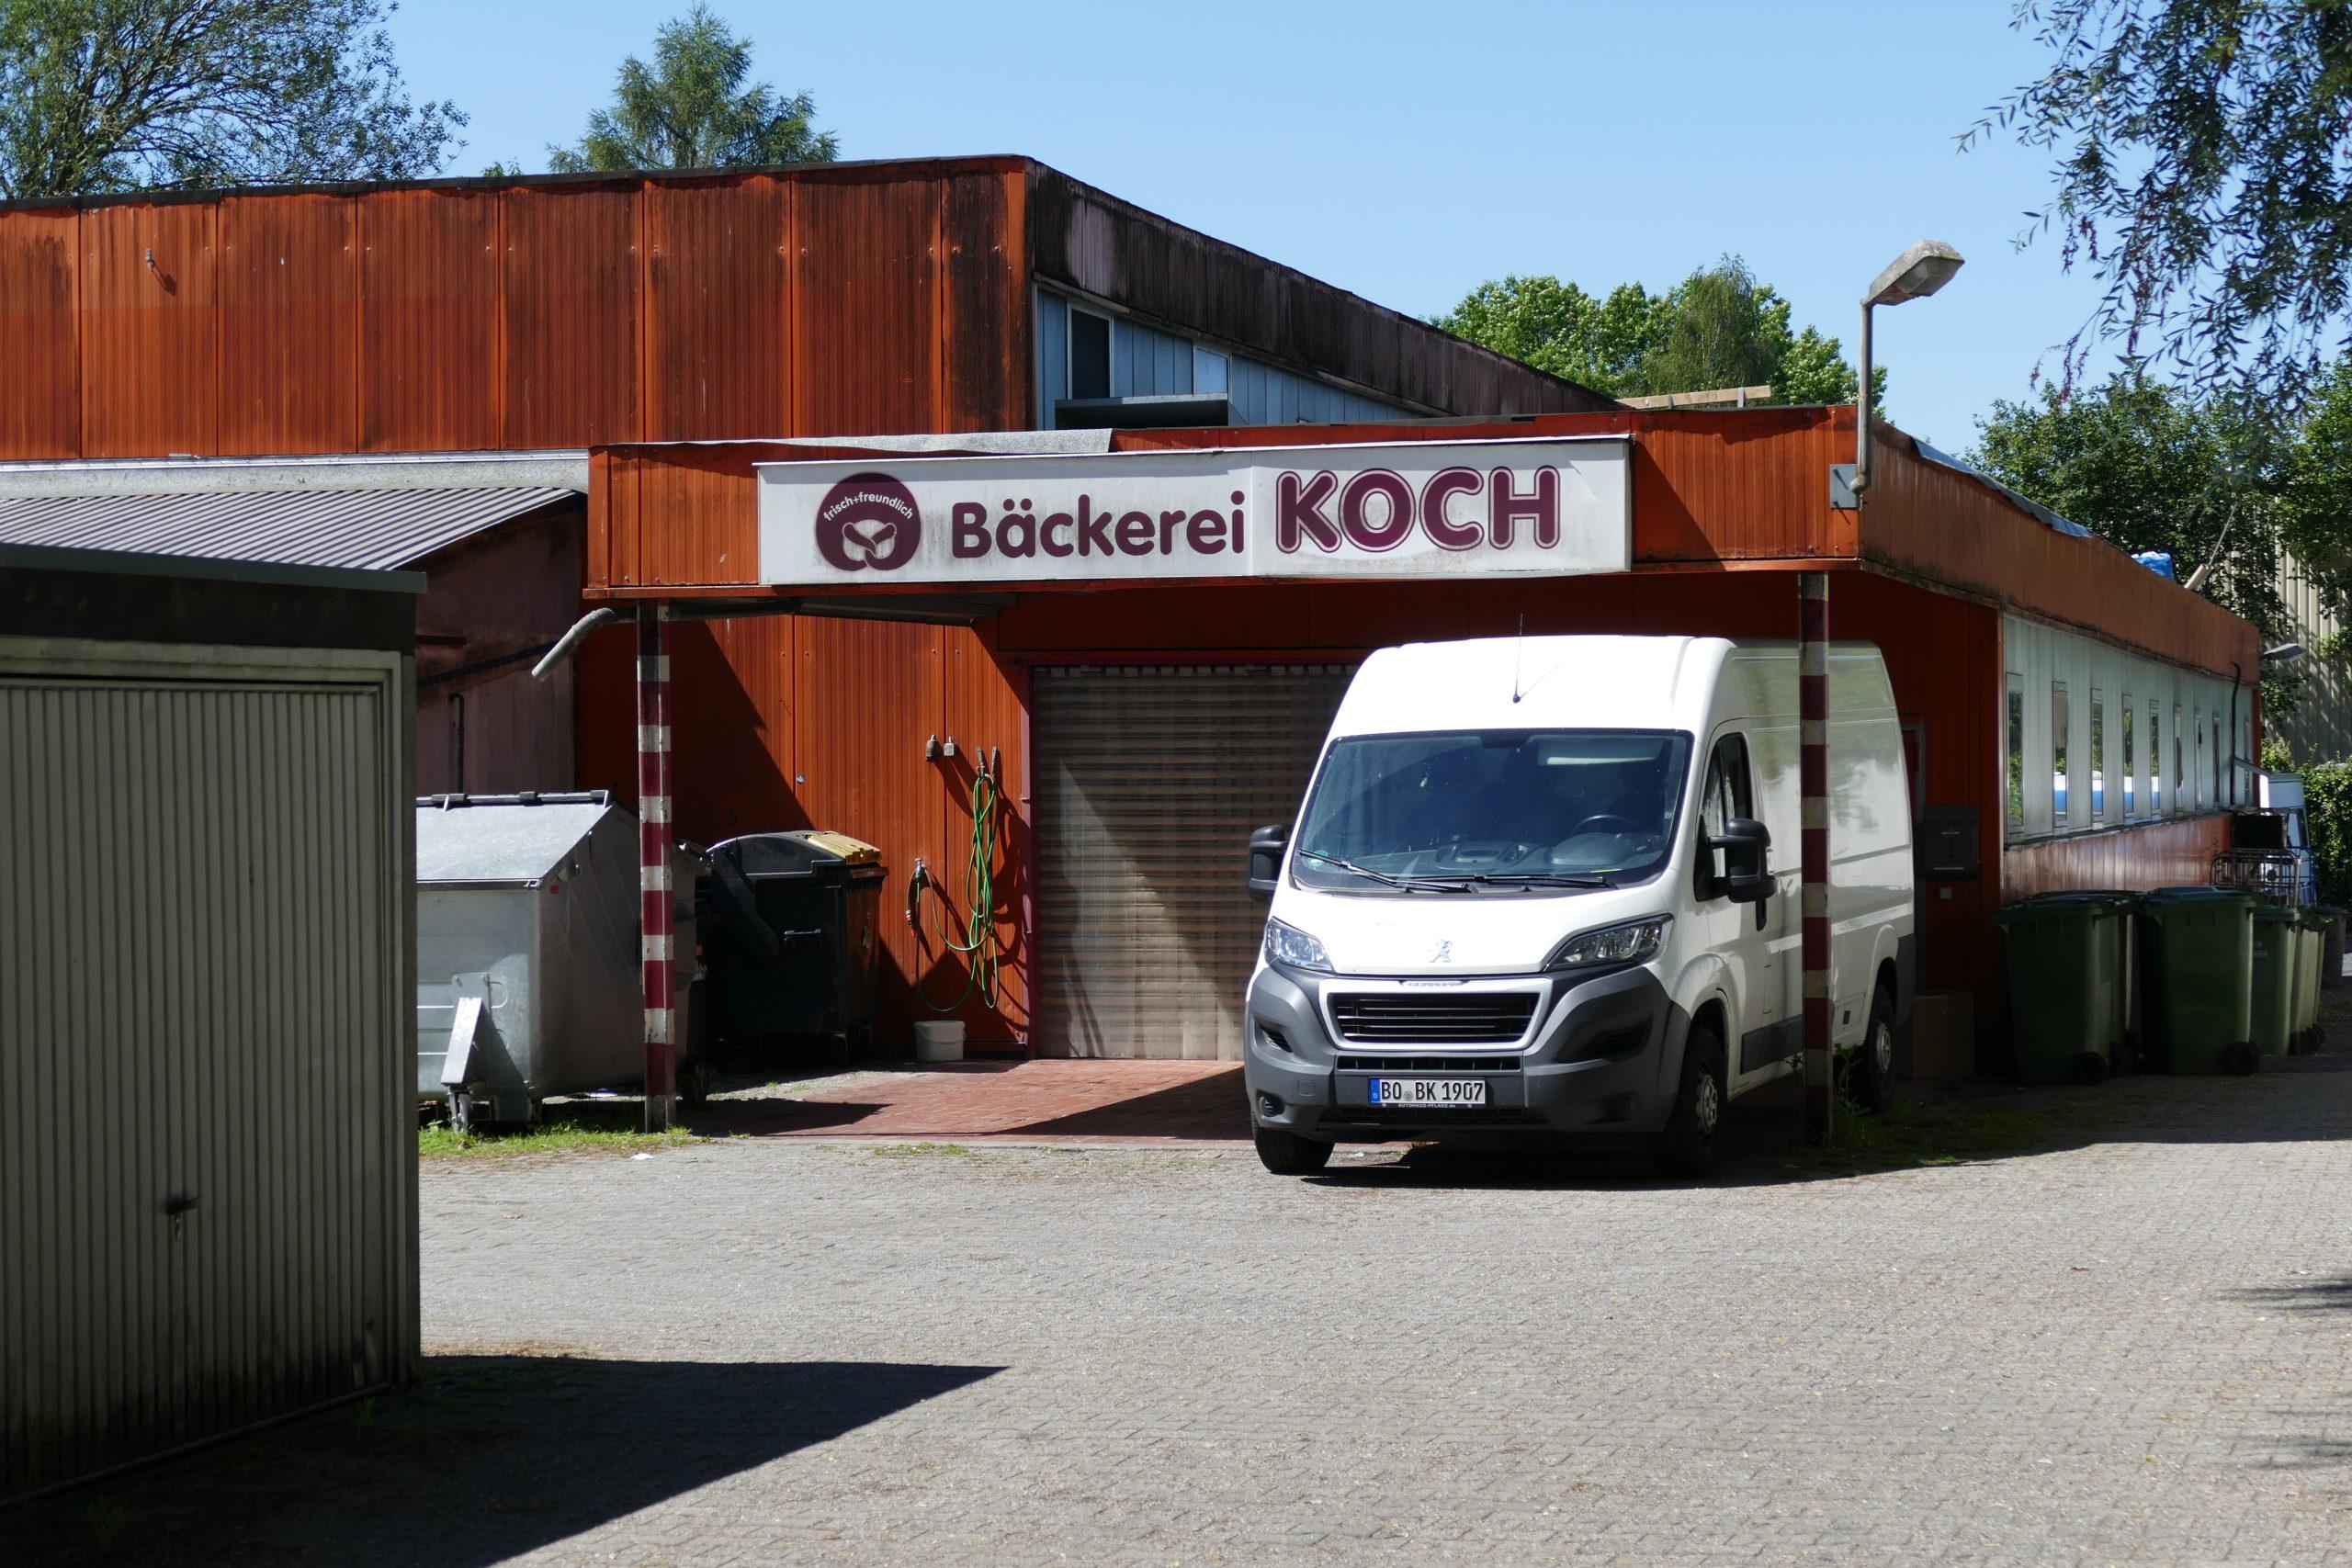 Eingang der Backstube von Bäckerei Koch